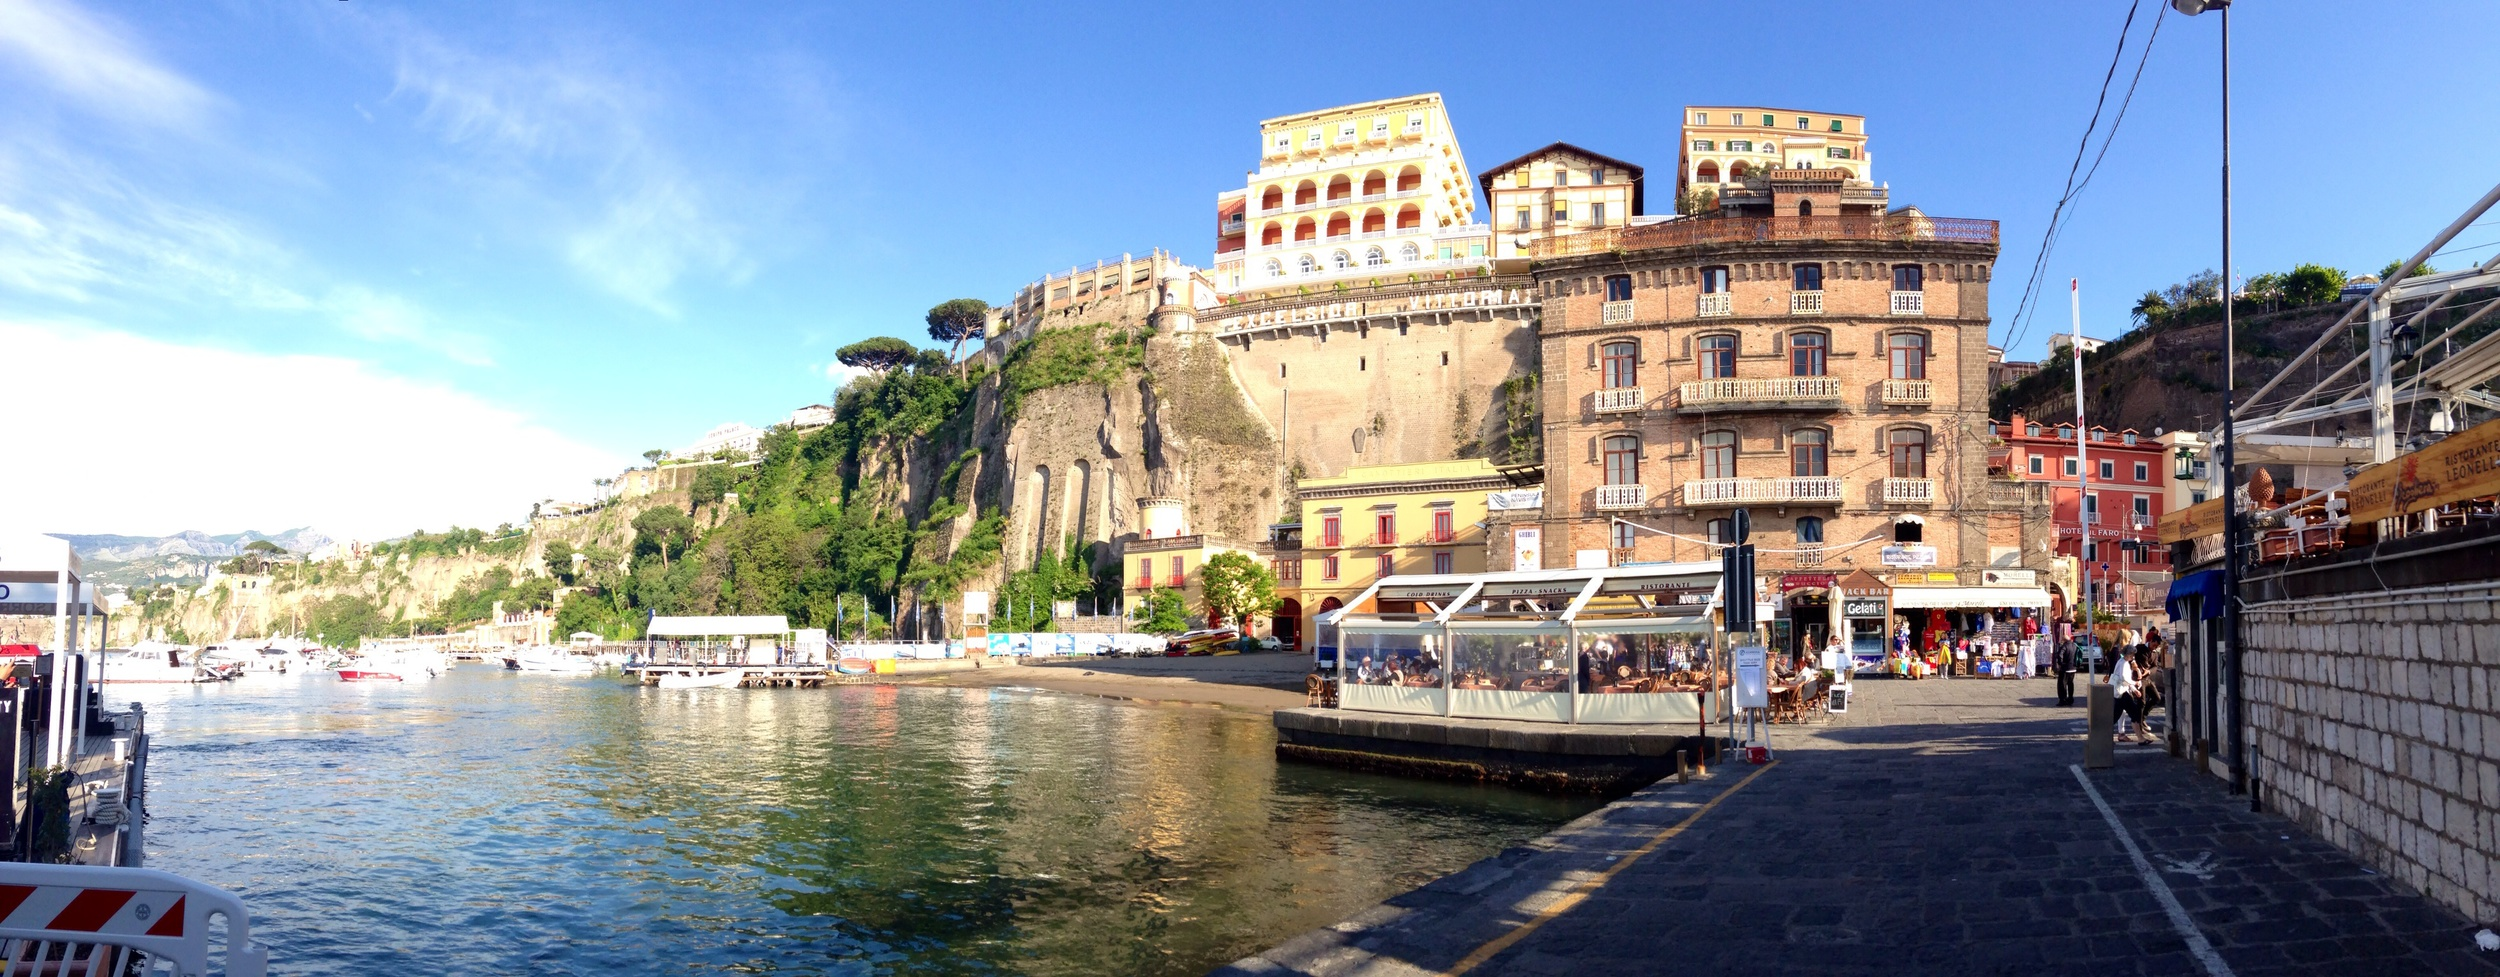 The harbor in Sorrento, Italy.